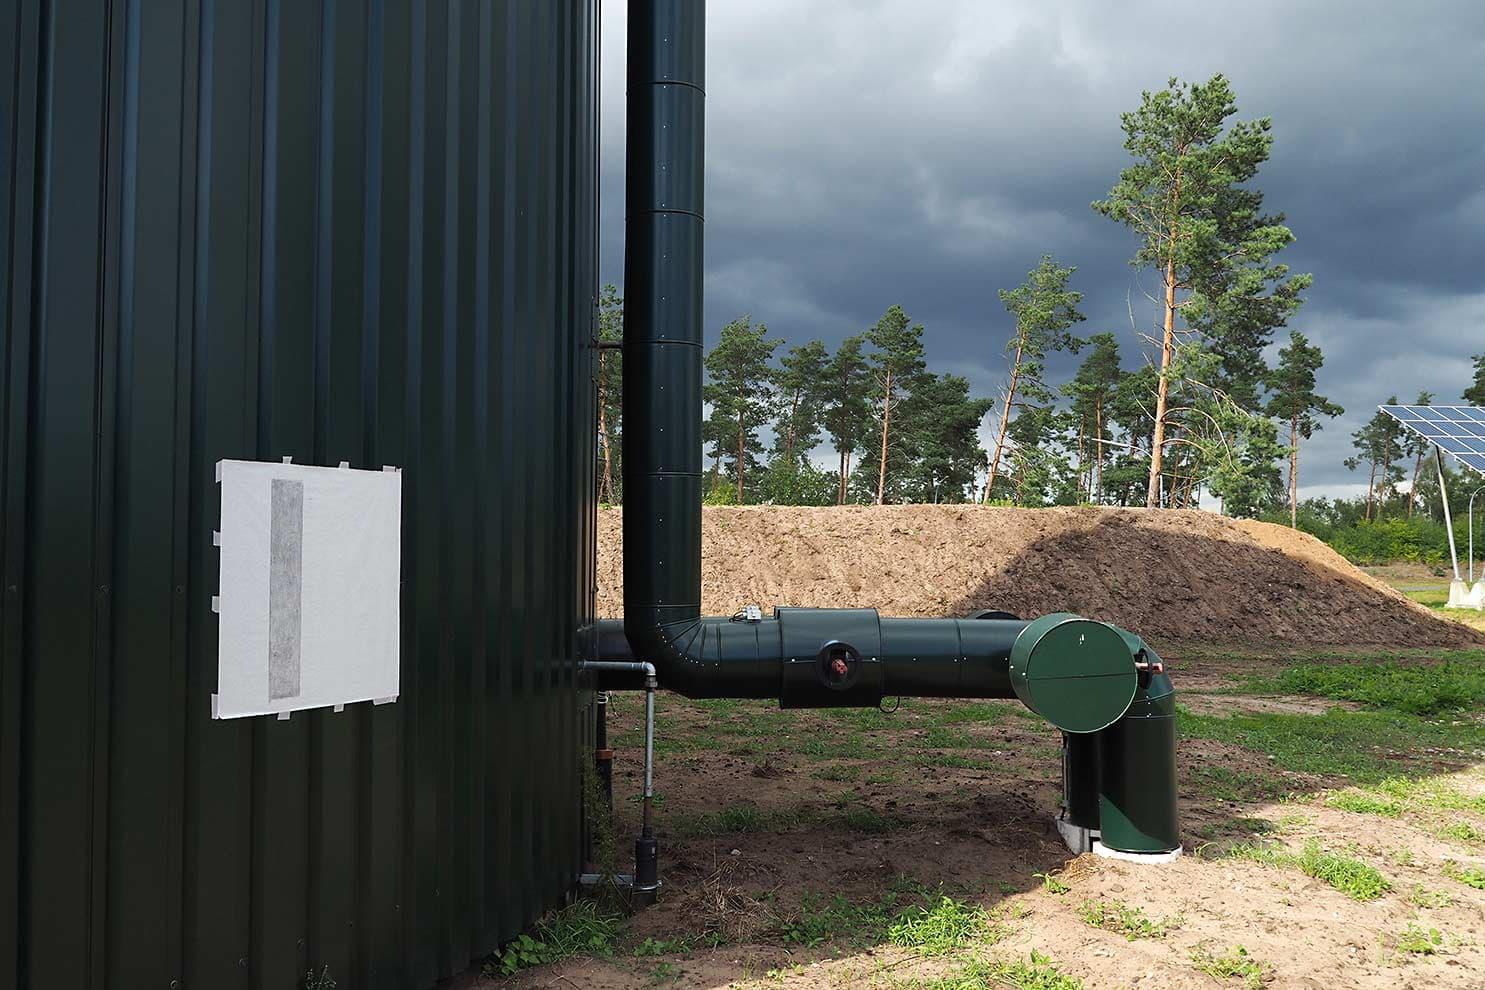 EnergieCultuur-EnergieKultur; biogas Saerbeck; foto van frottage op terrein Bio-energiepark Saerbeck